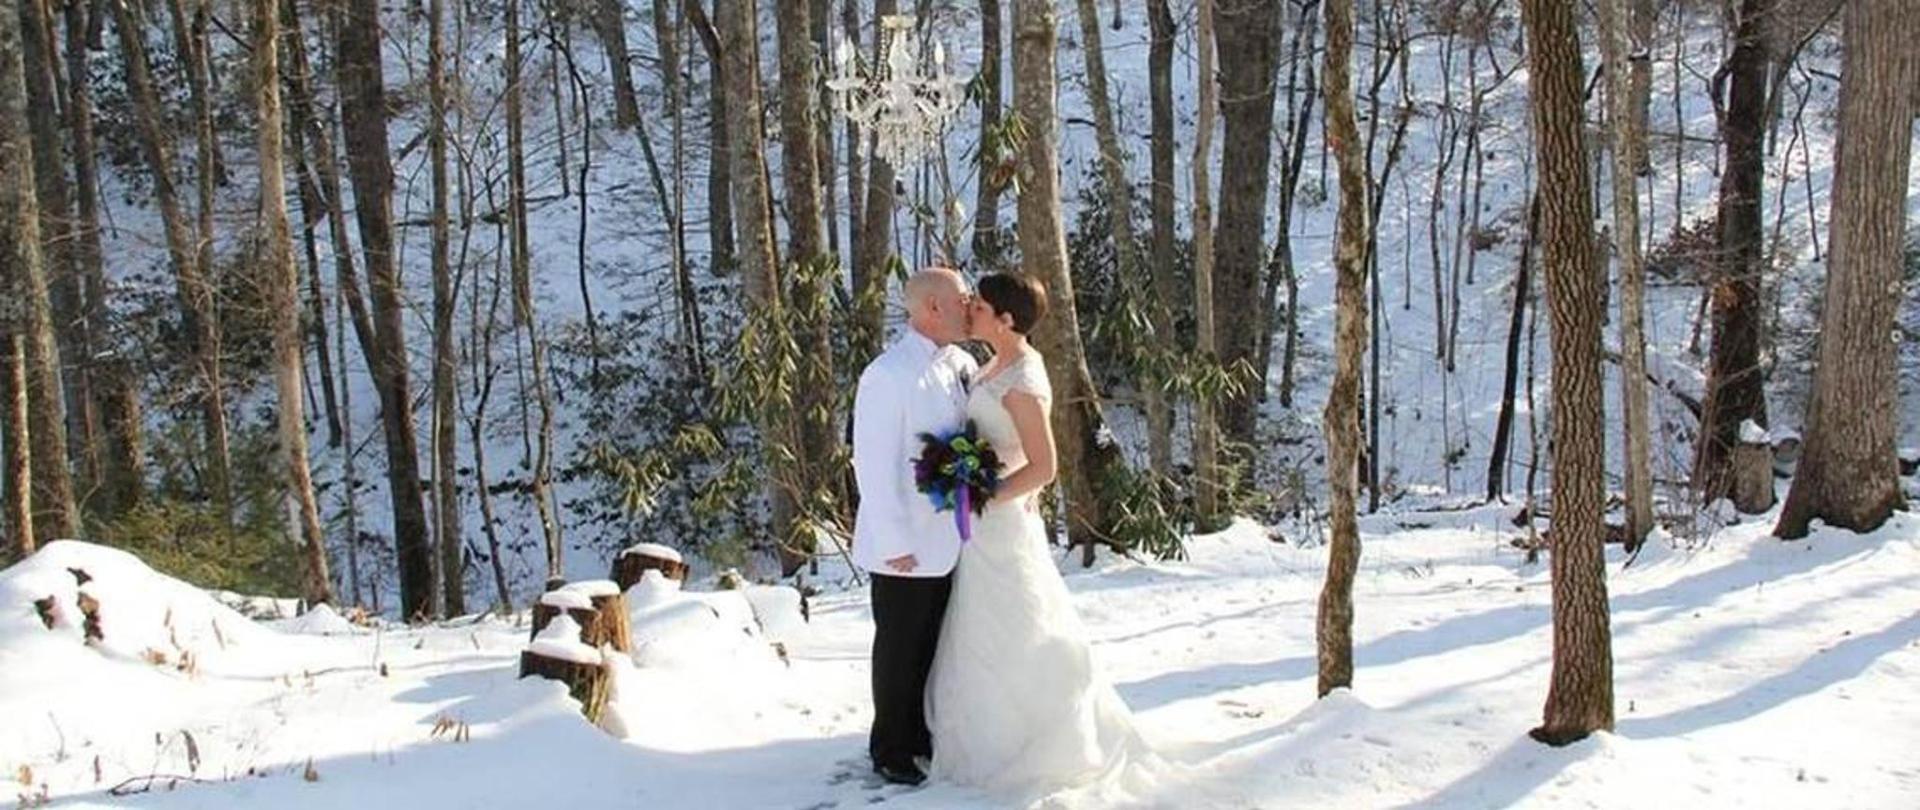 chapel-at-the-park-winter-wedding-01.jpg.1140x481_default.jpg